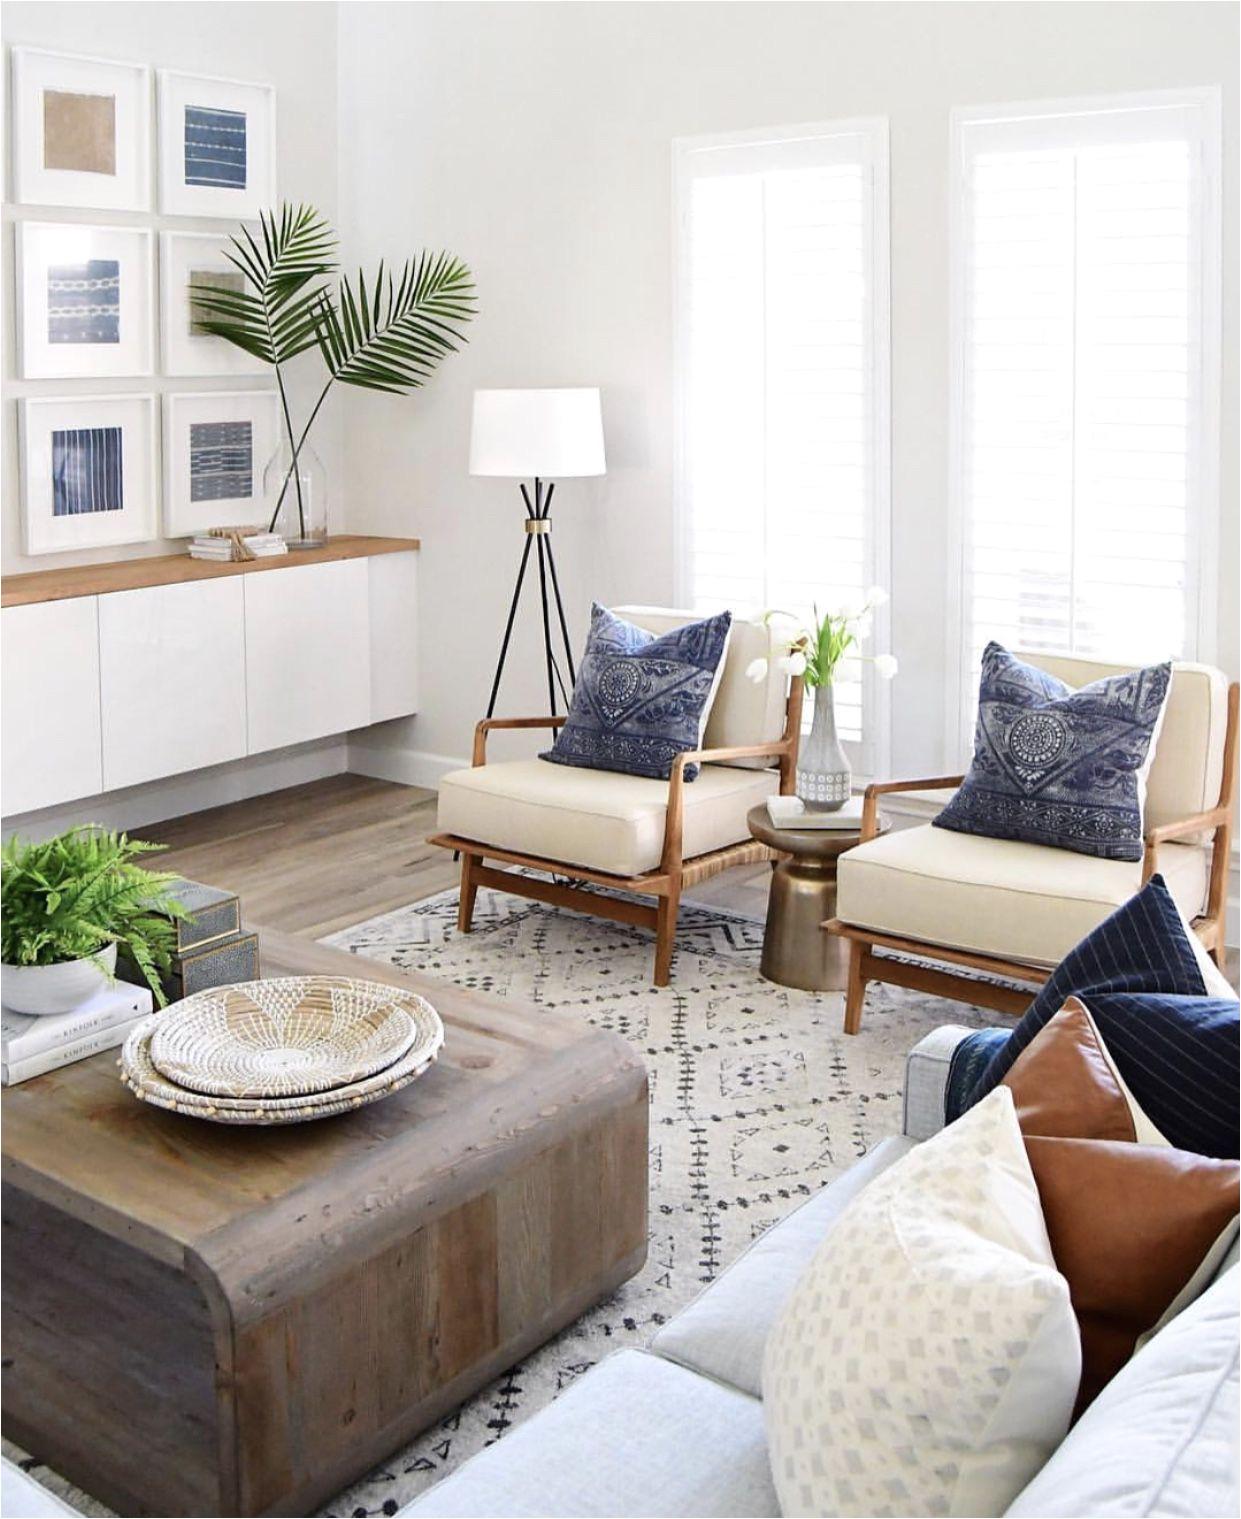 pin by haley nazar on home ideas pinterest hogar muebles salon and decorar salon pequea o